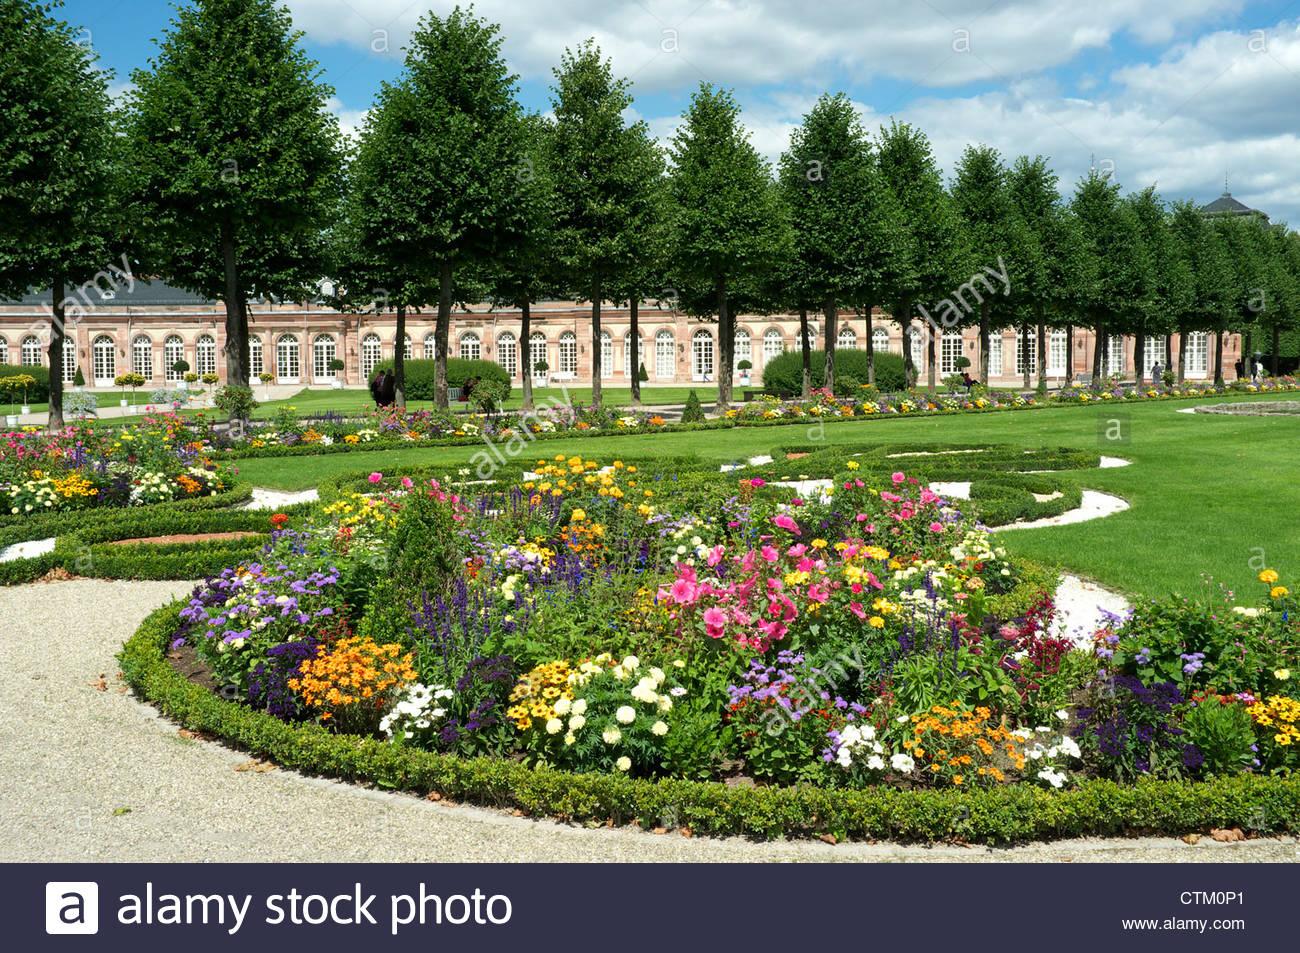 Schwetzingen Palace garden scene, Baden-Württemberg, Germany. - Stock Image